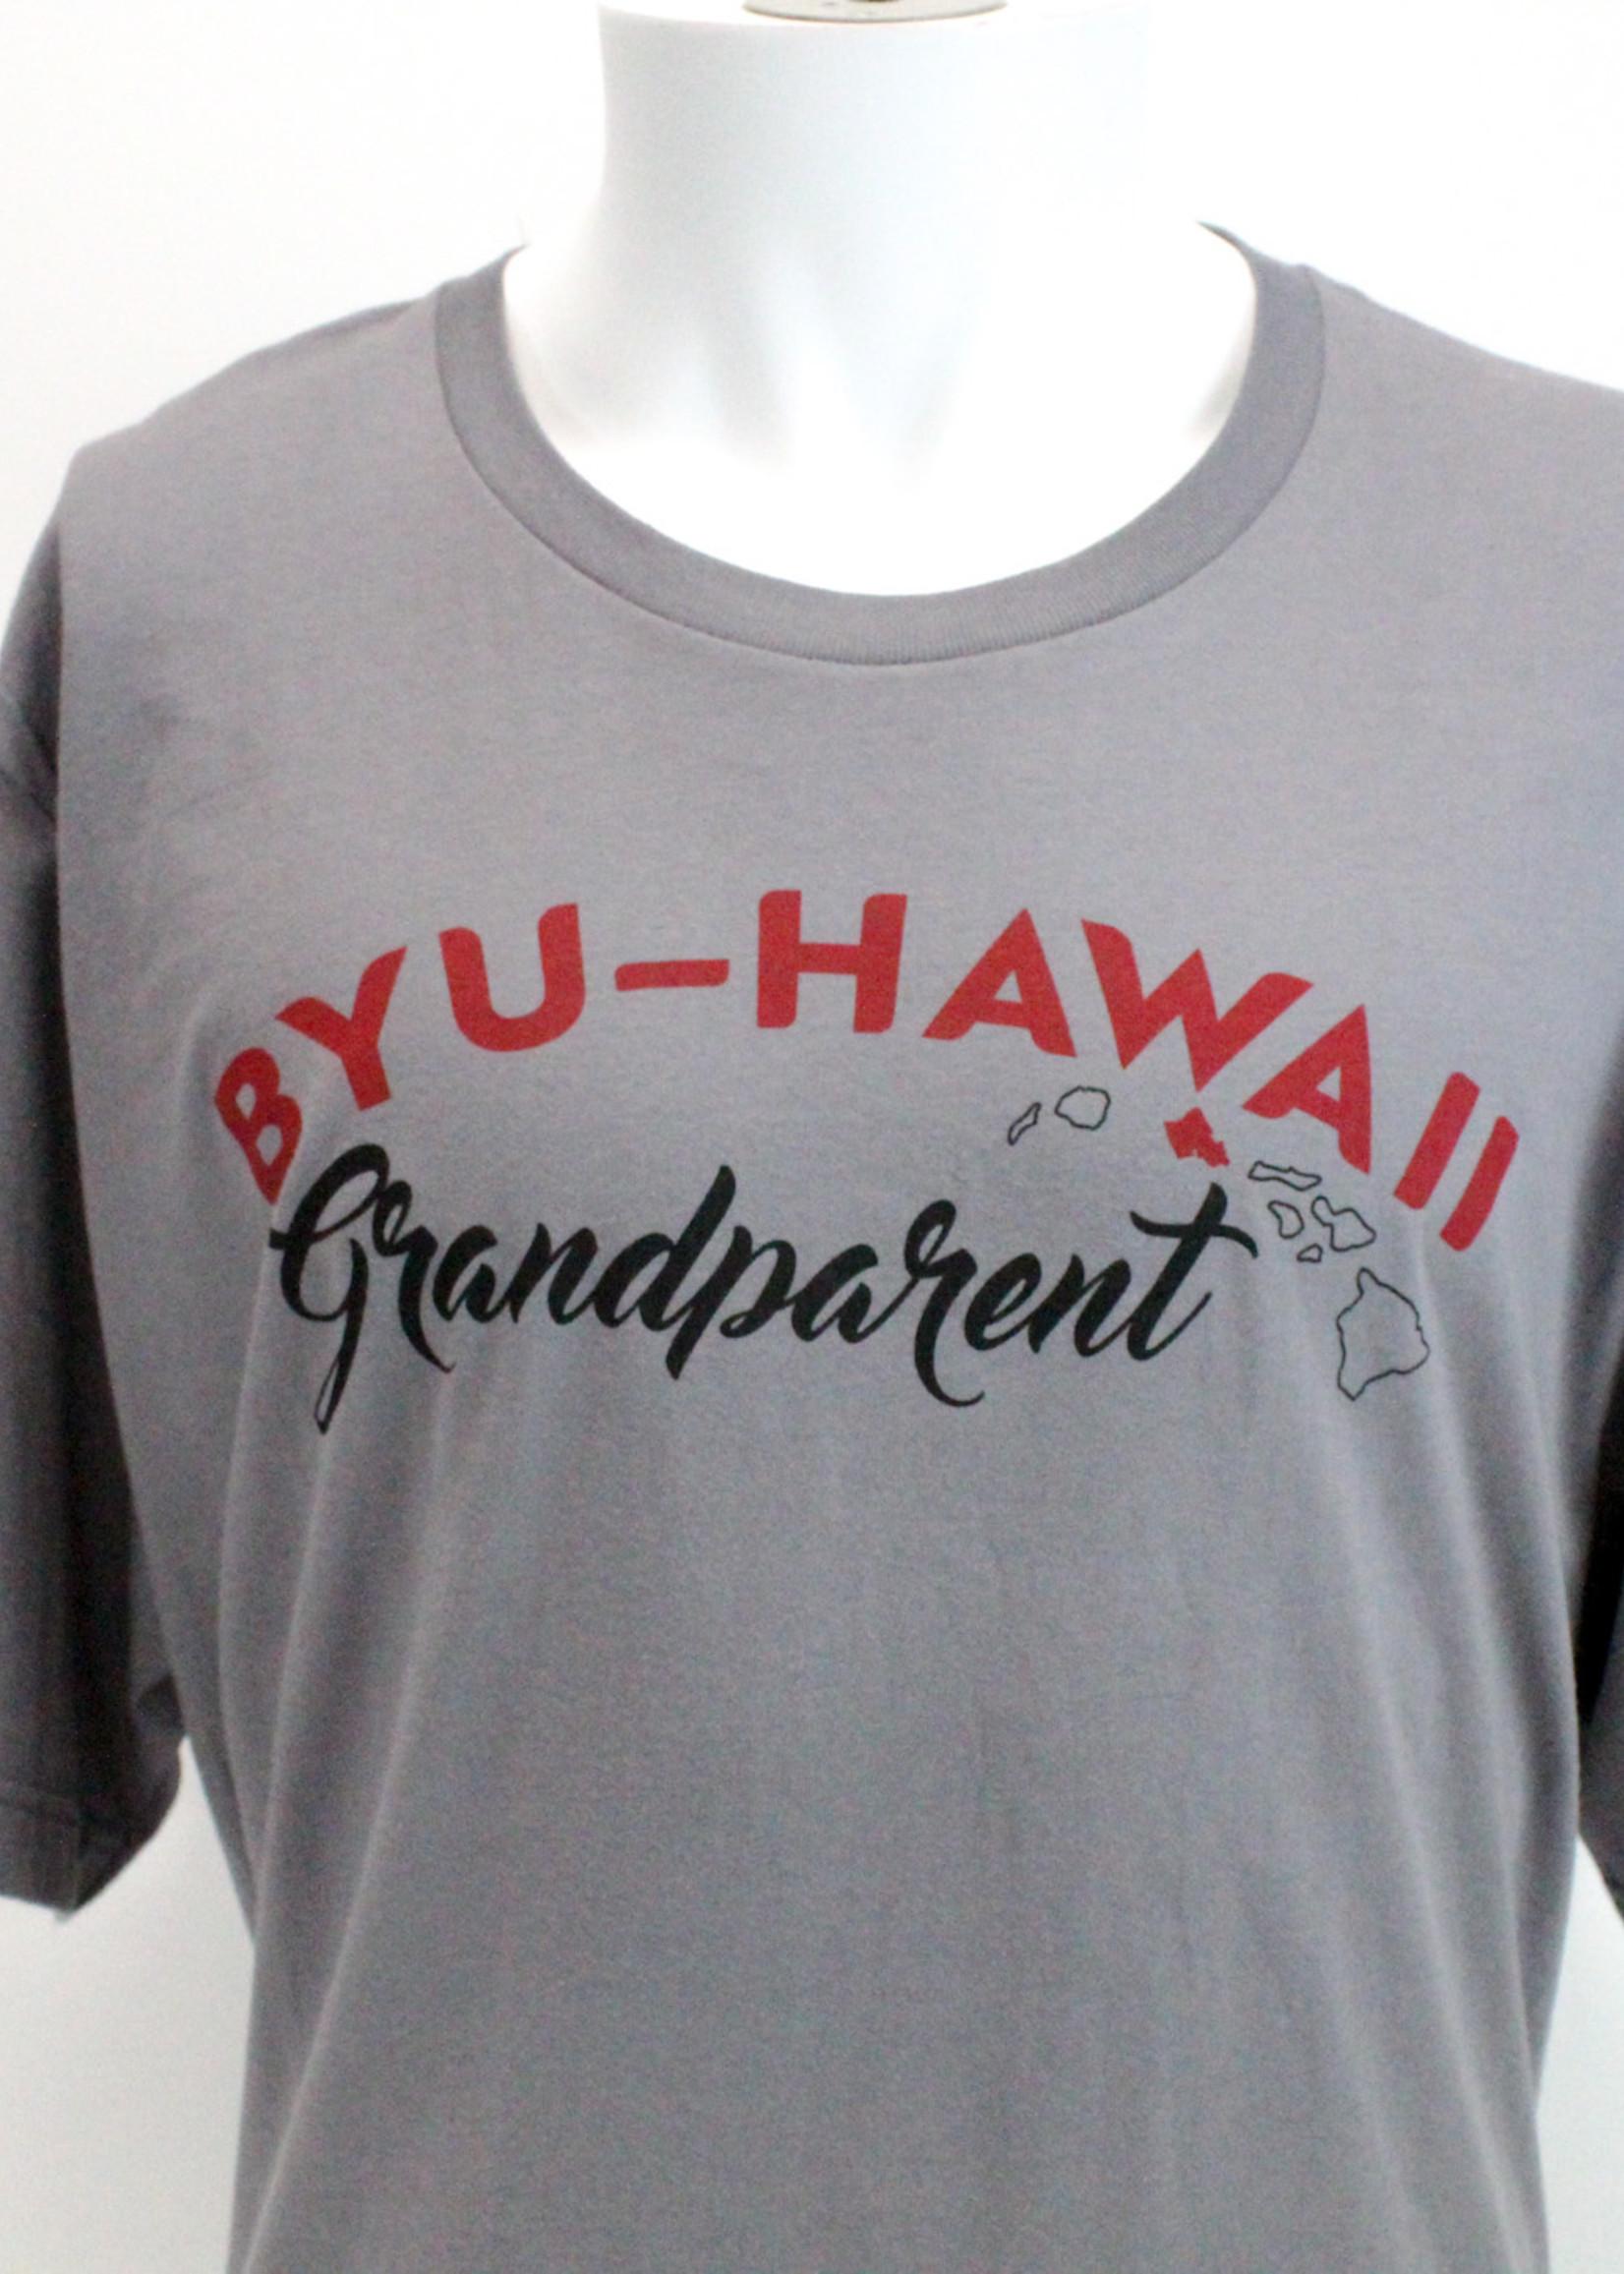 Clearance - BYU-Hawaii Grandparent T-shirt